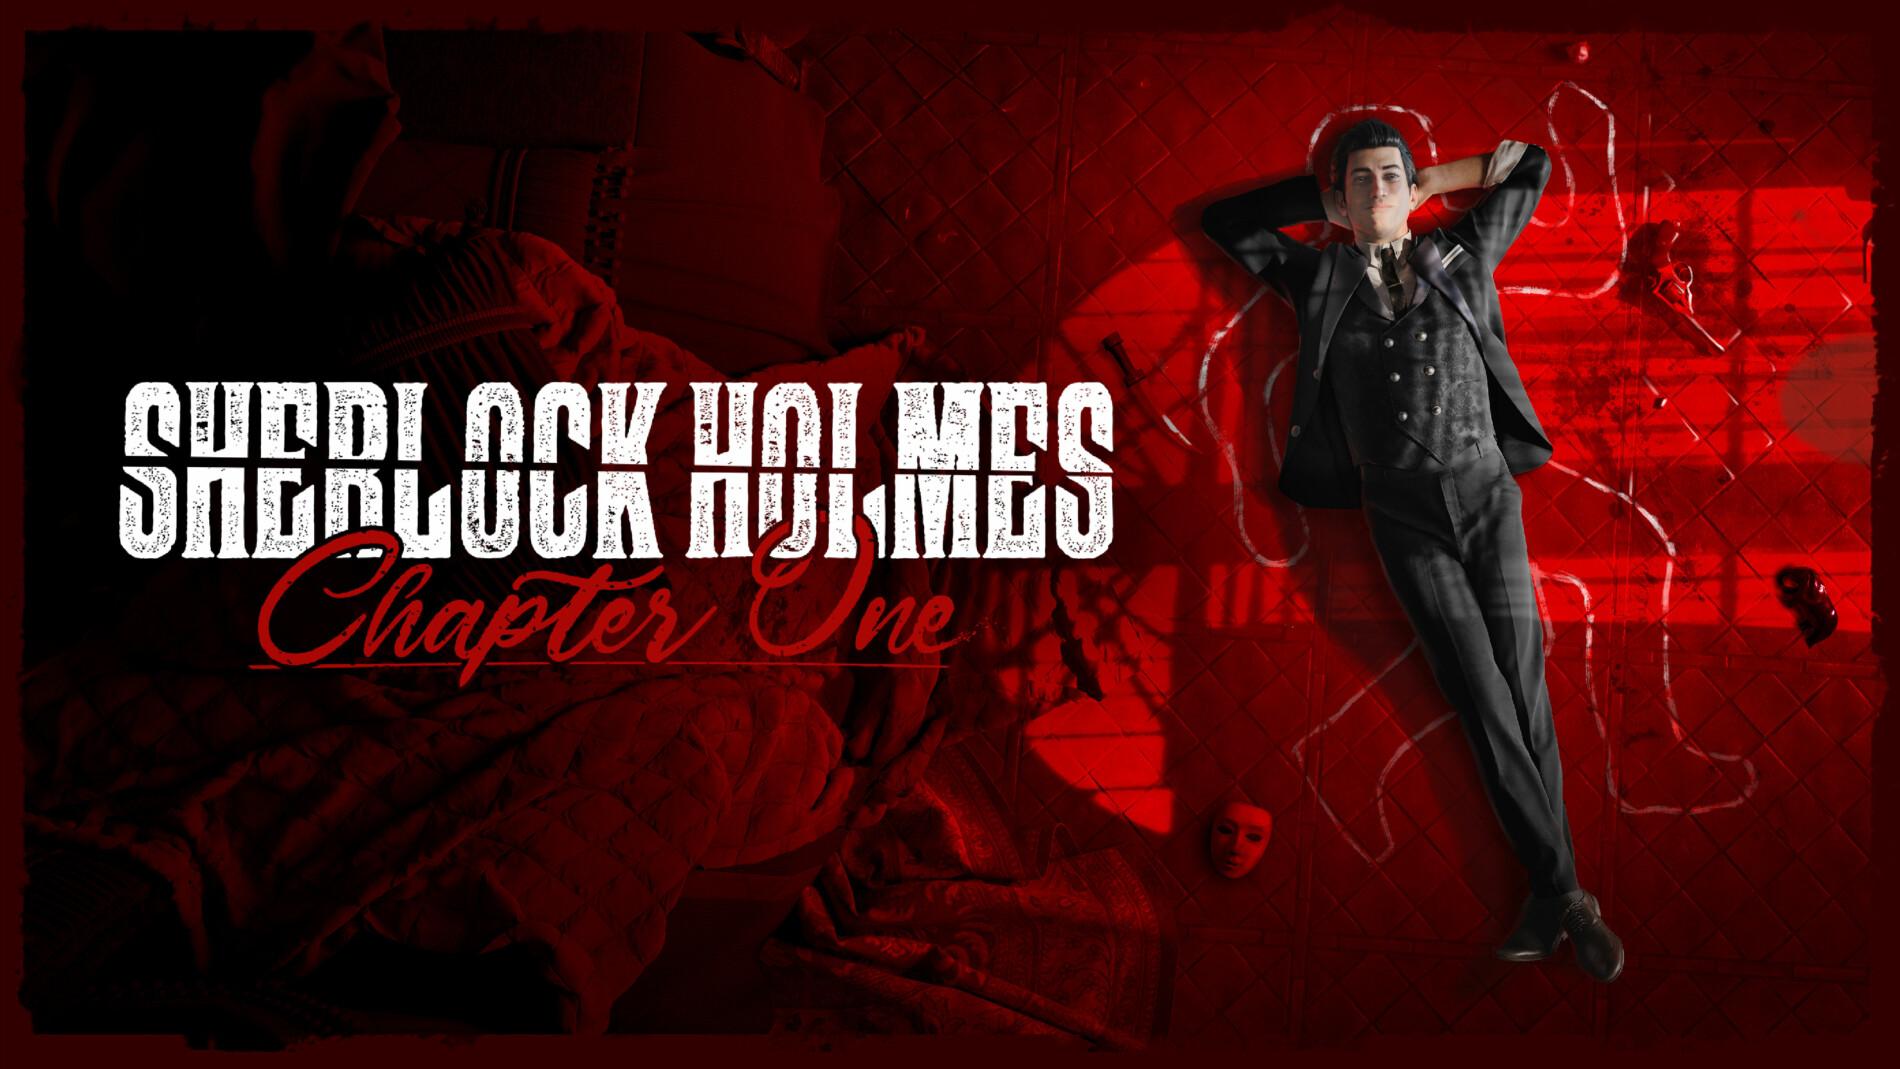 sherlock holmes chapter one novembre